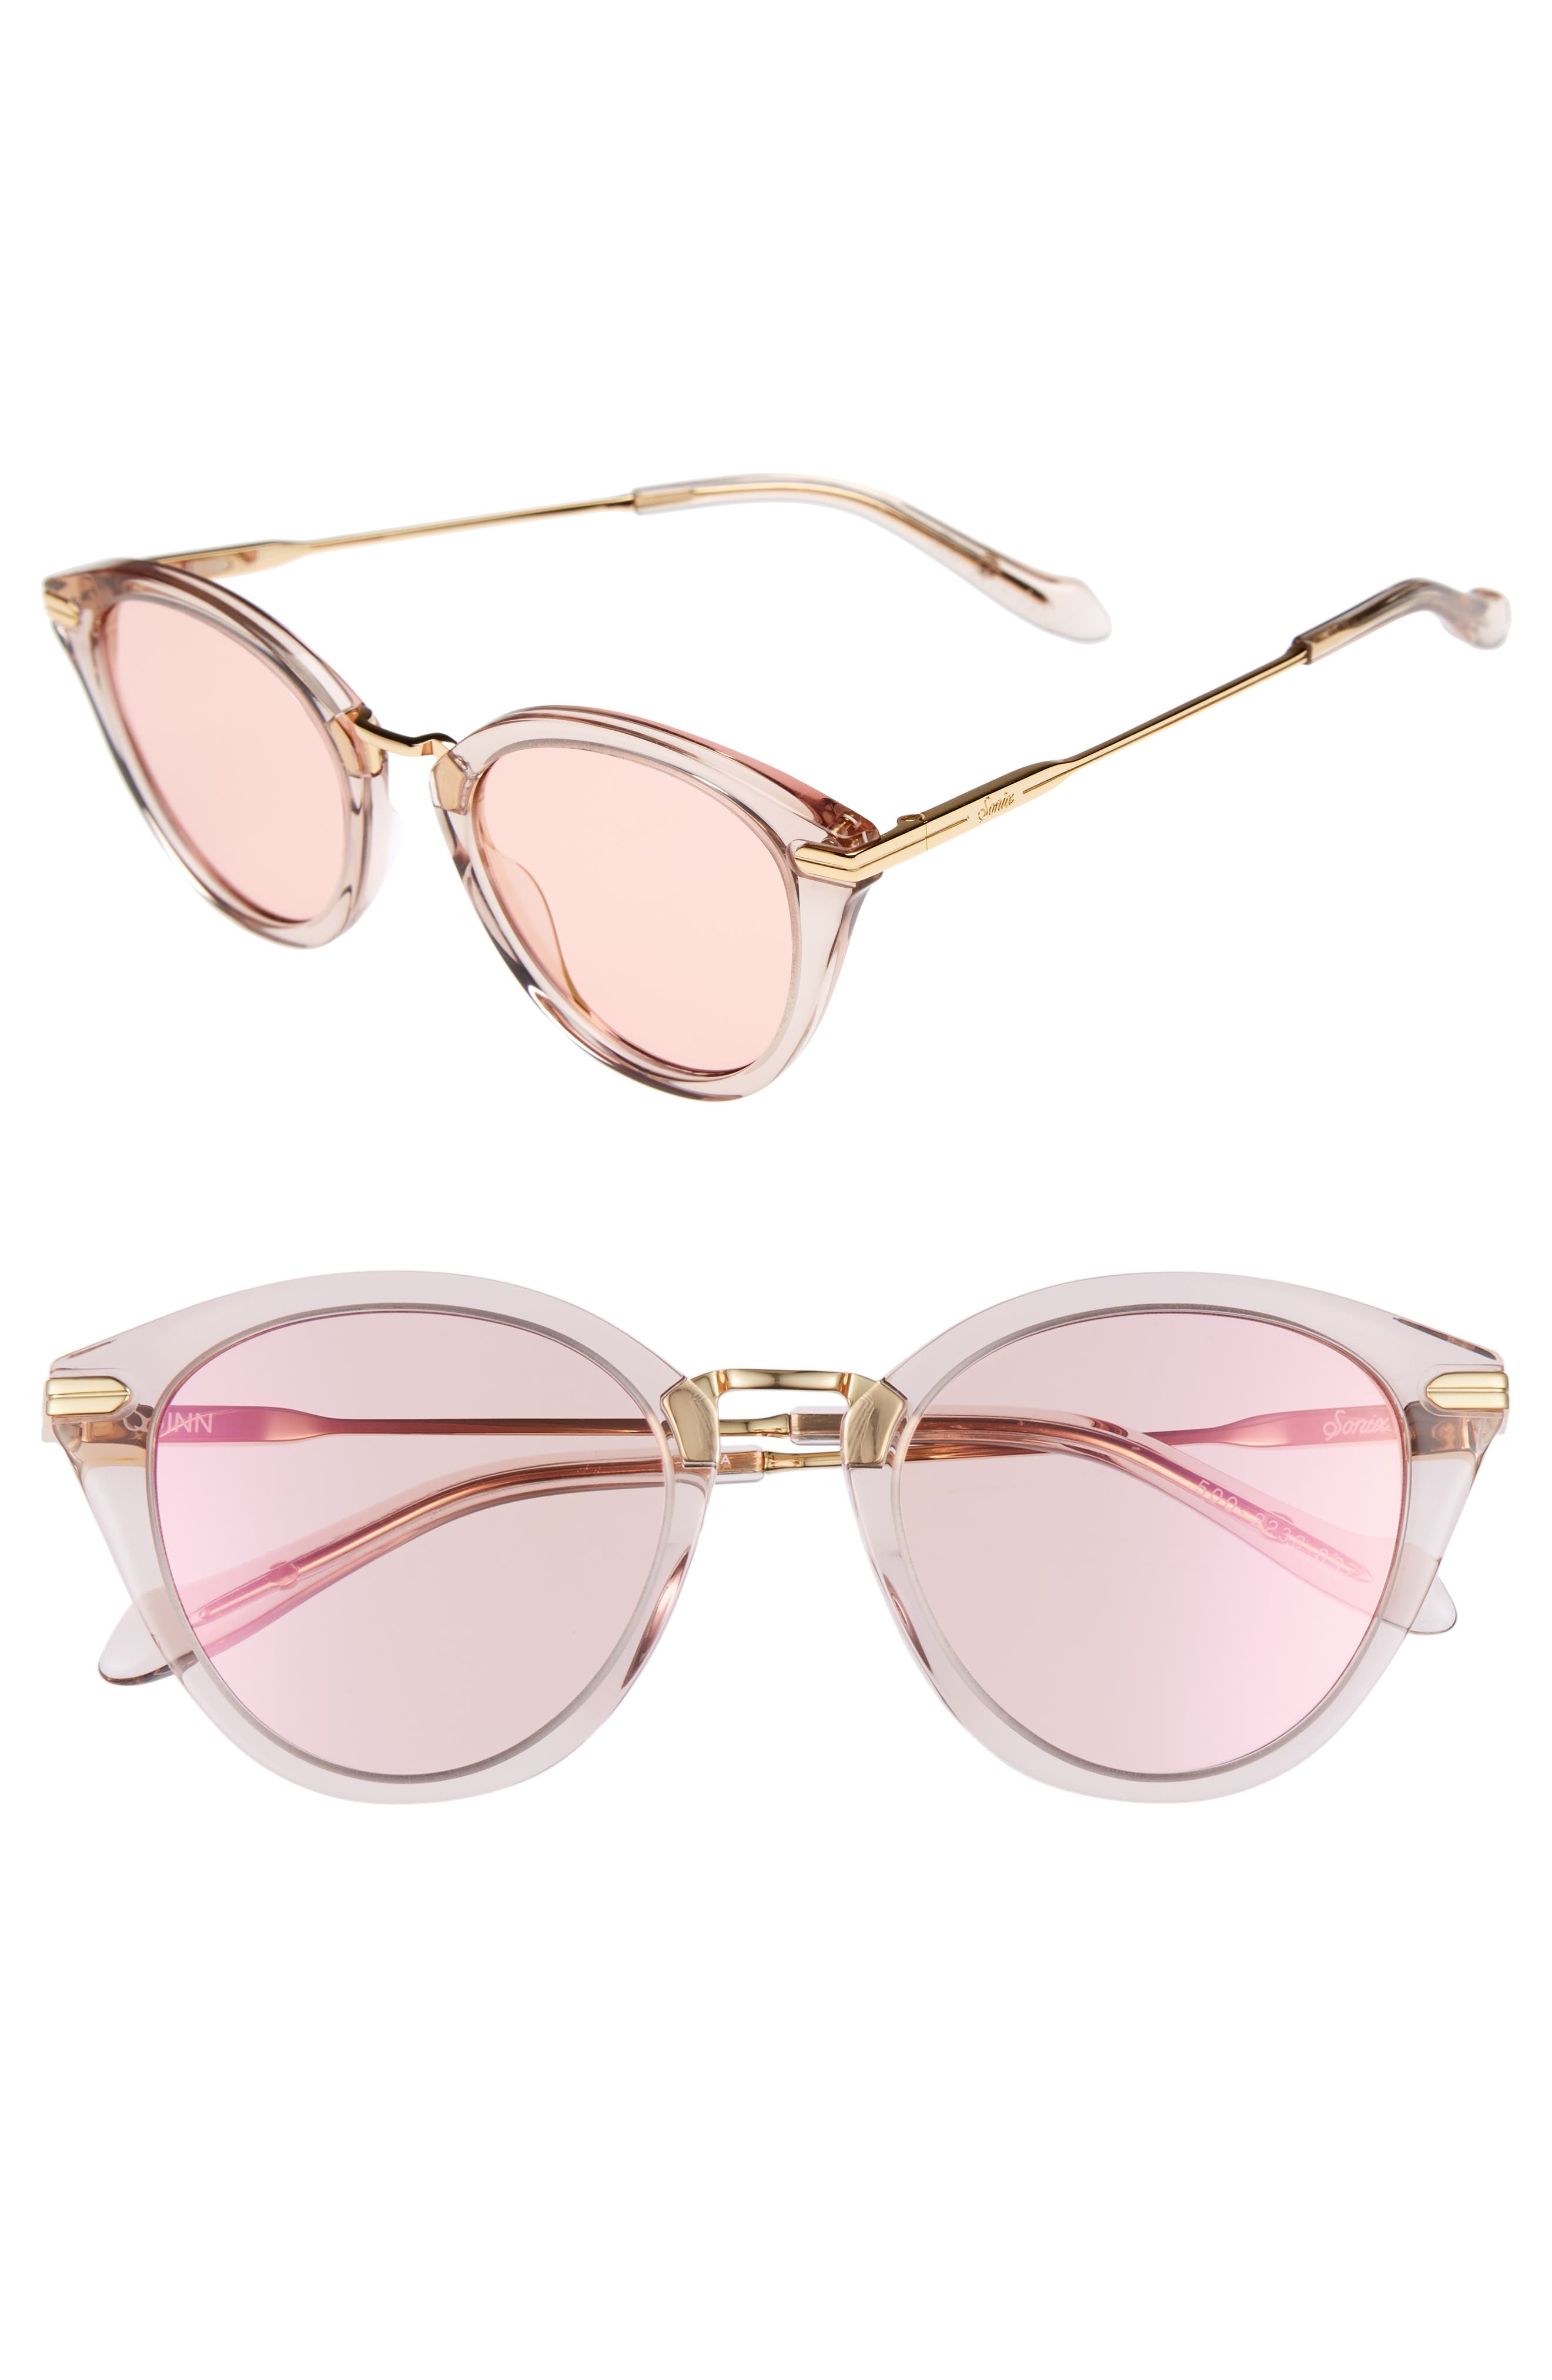 Quinn 48mm Cat Eye Sunglasses,                             Main thumbnail 4, color,